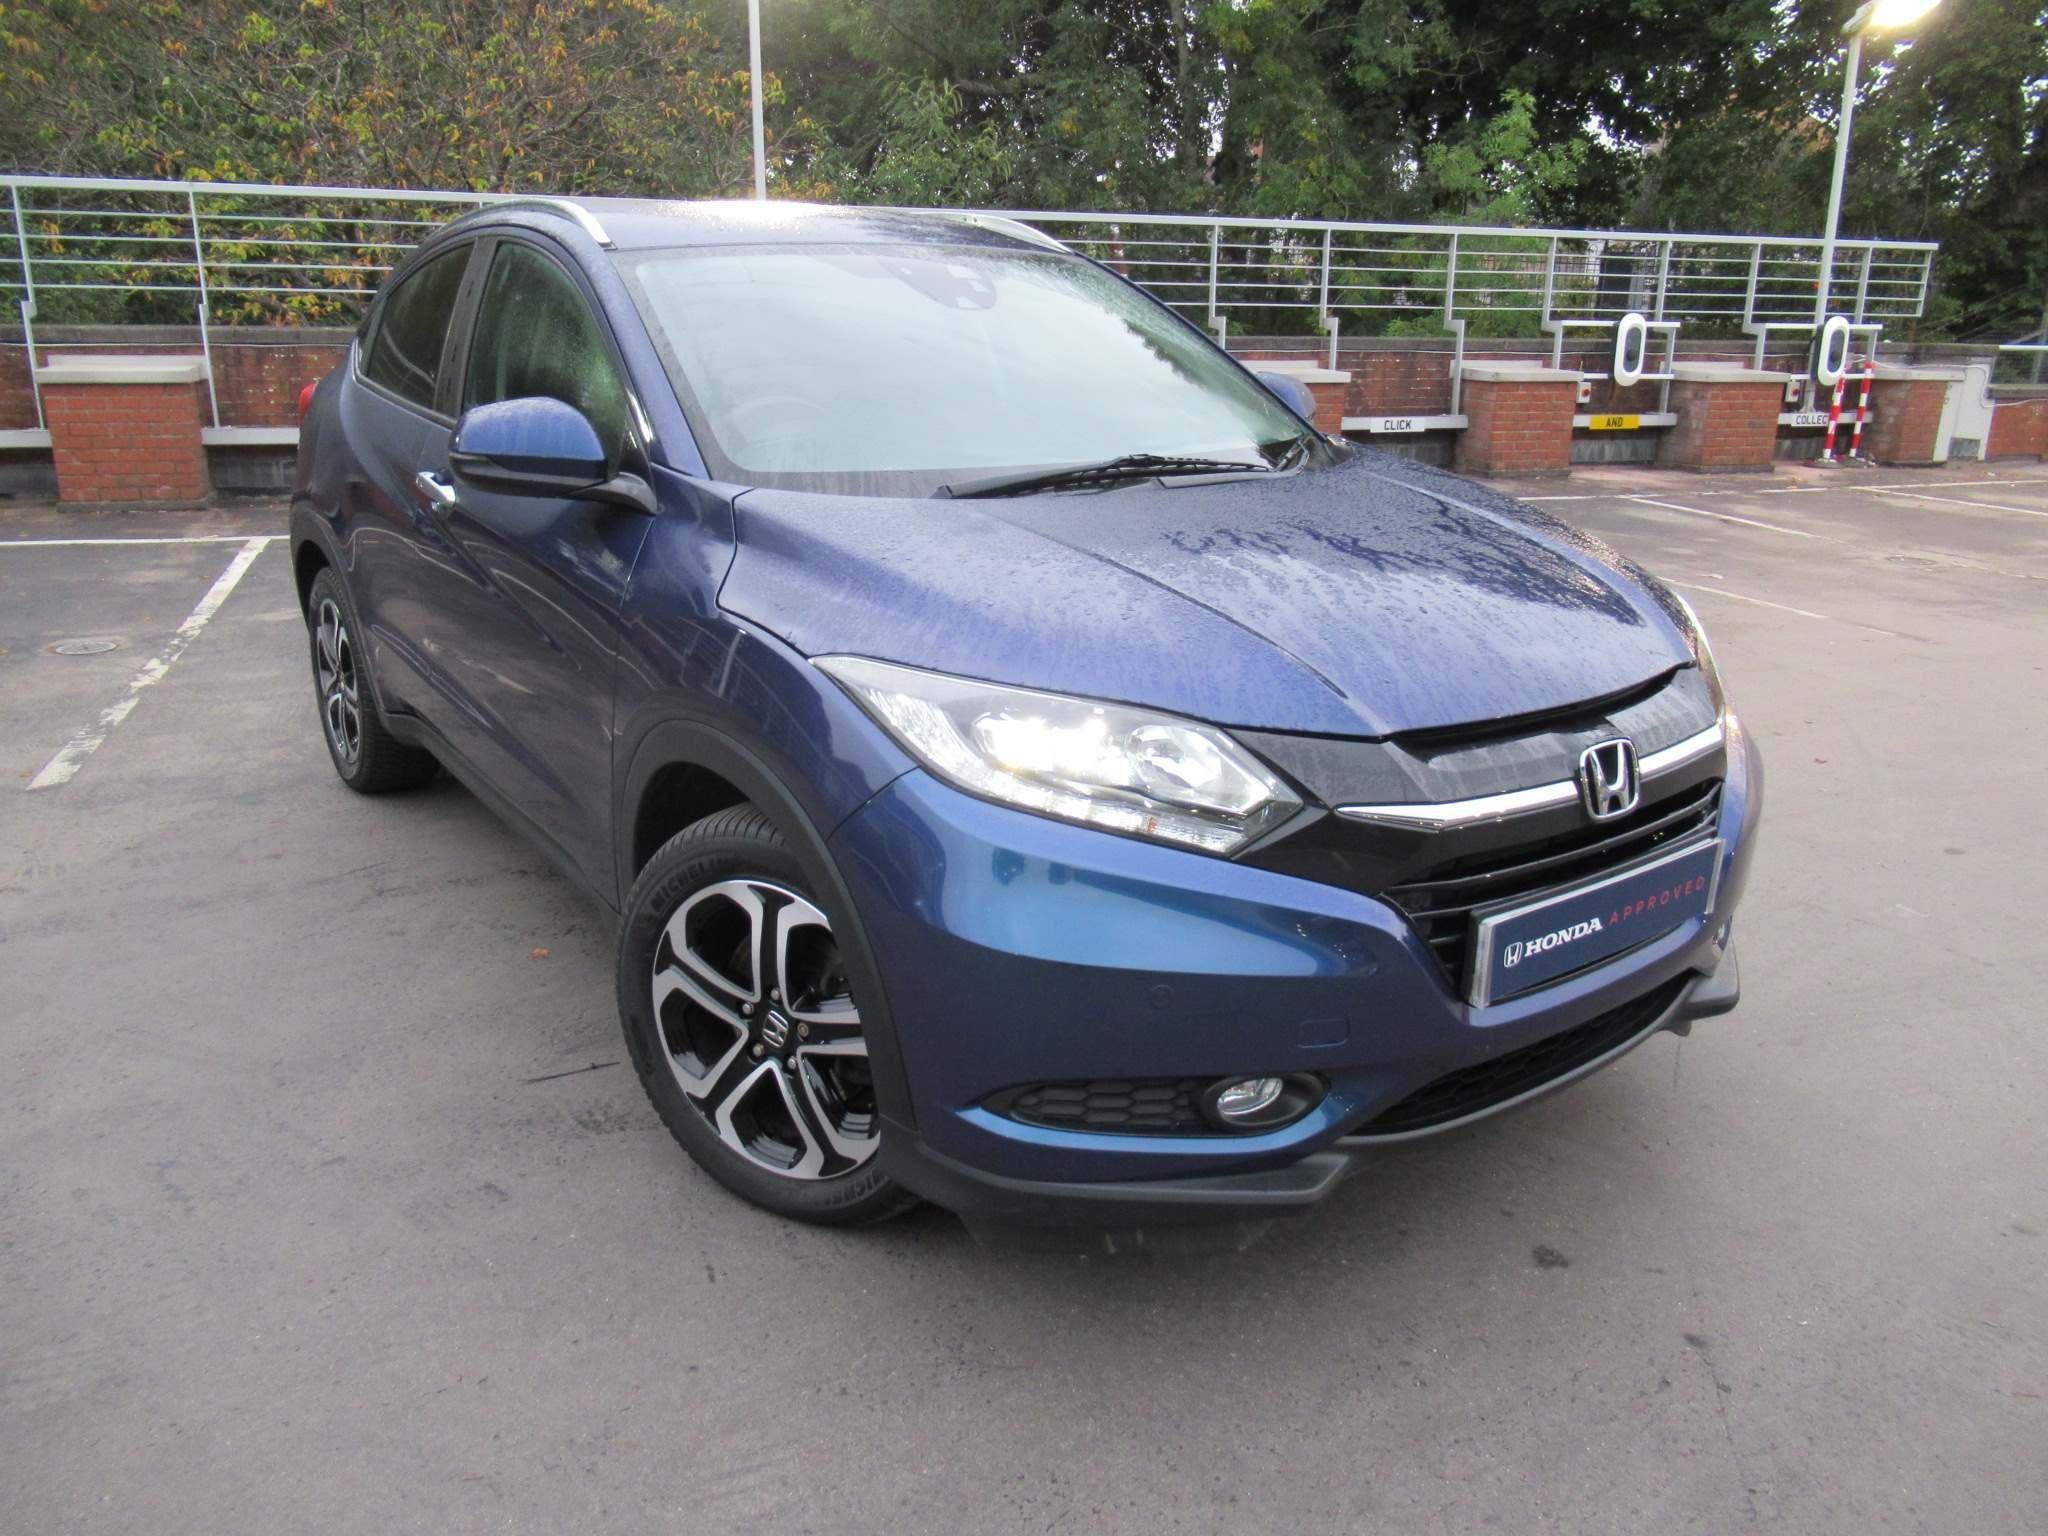 Honda HR-V 1.6 i-DTEC EX (s/s) 5dr